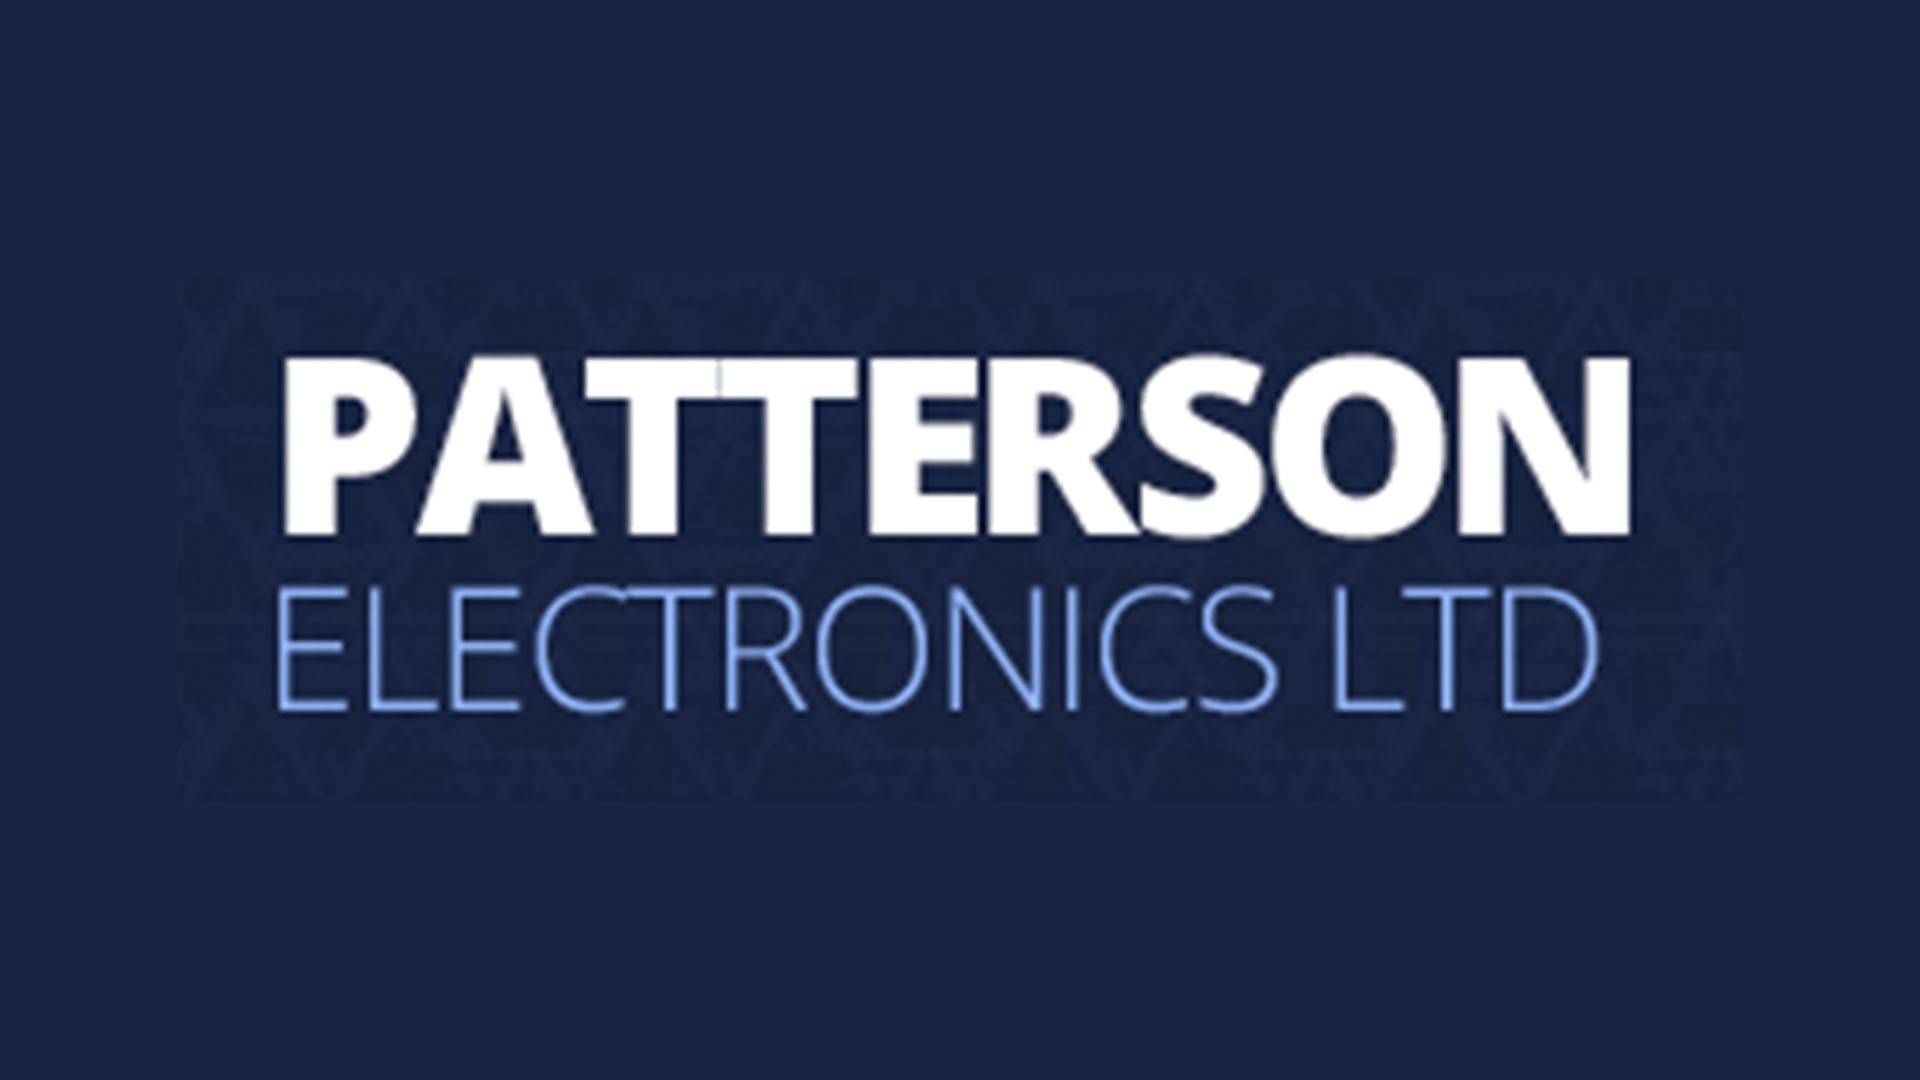 Patterson Electronics